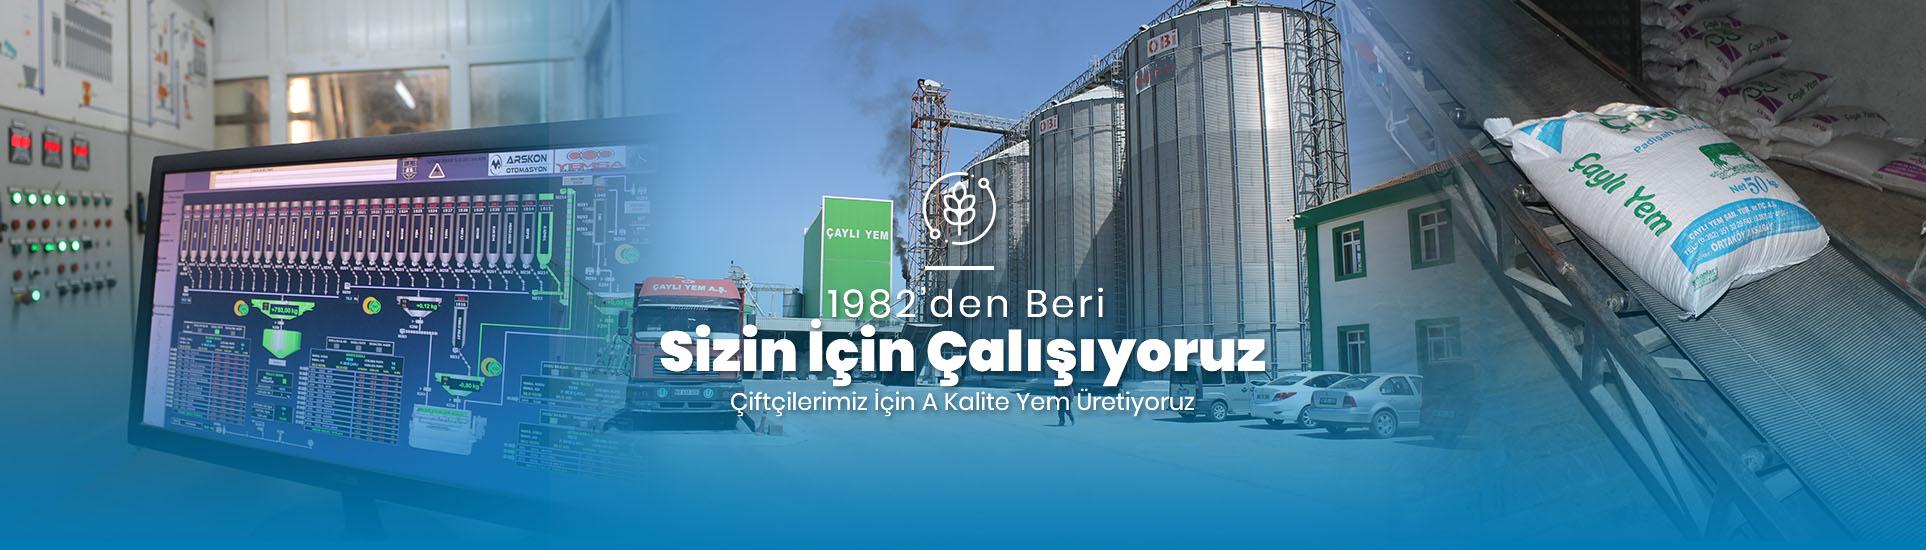 http://cayliyem.com.tr/Slayt - 3